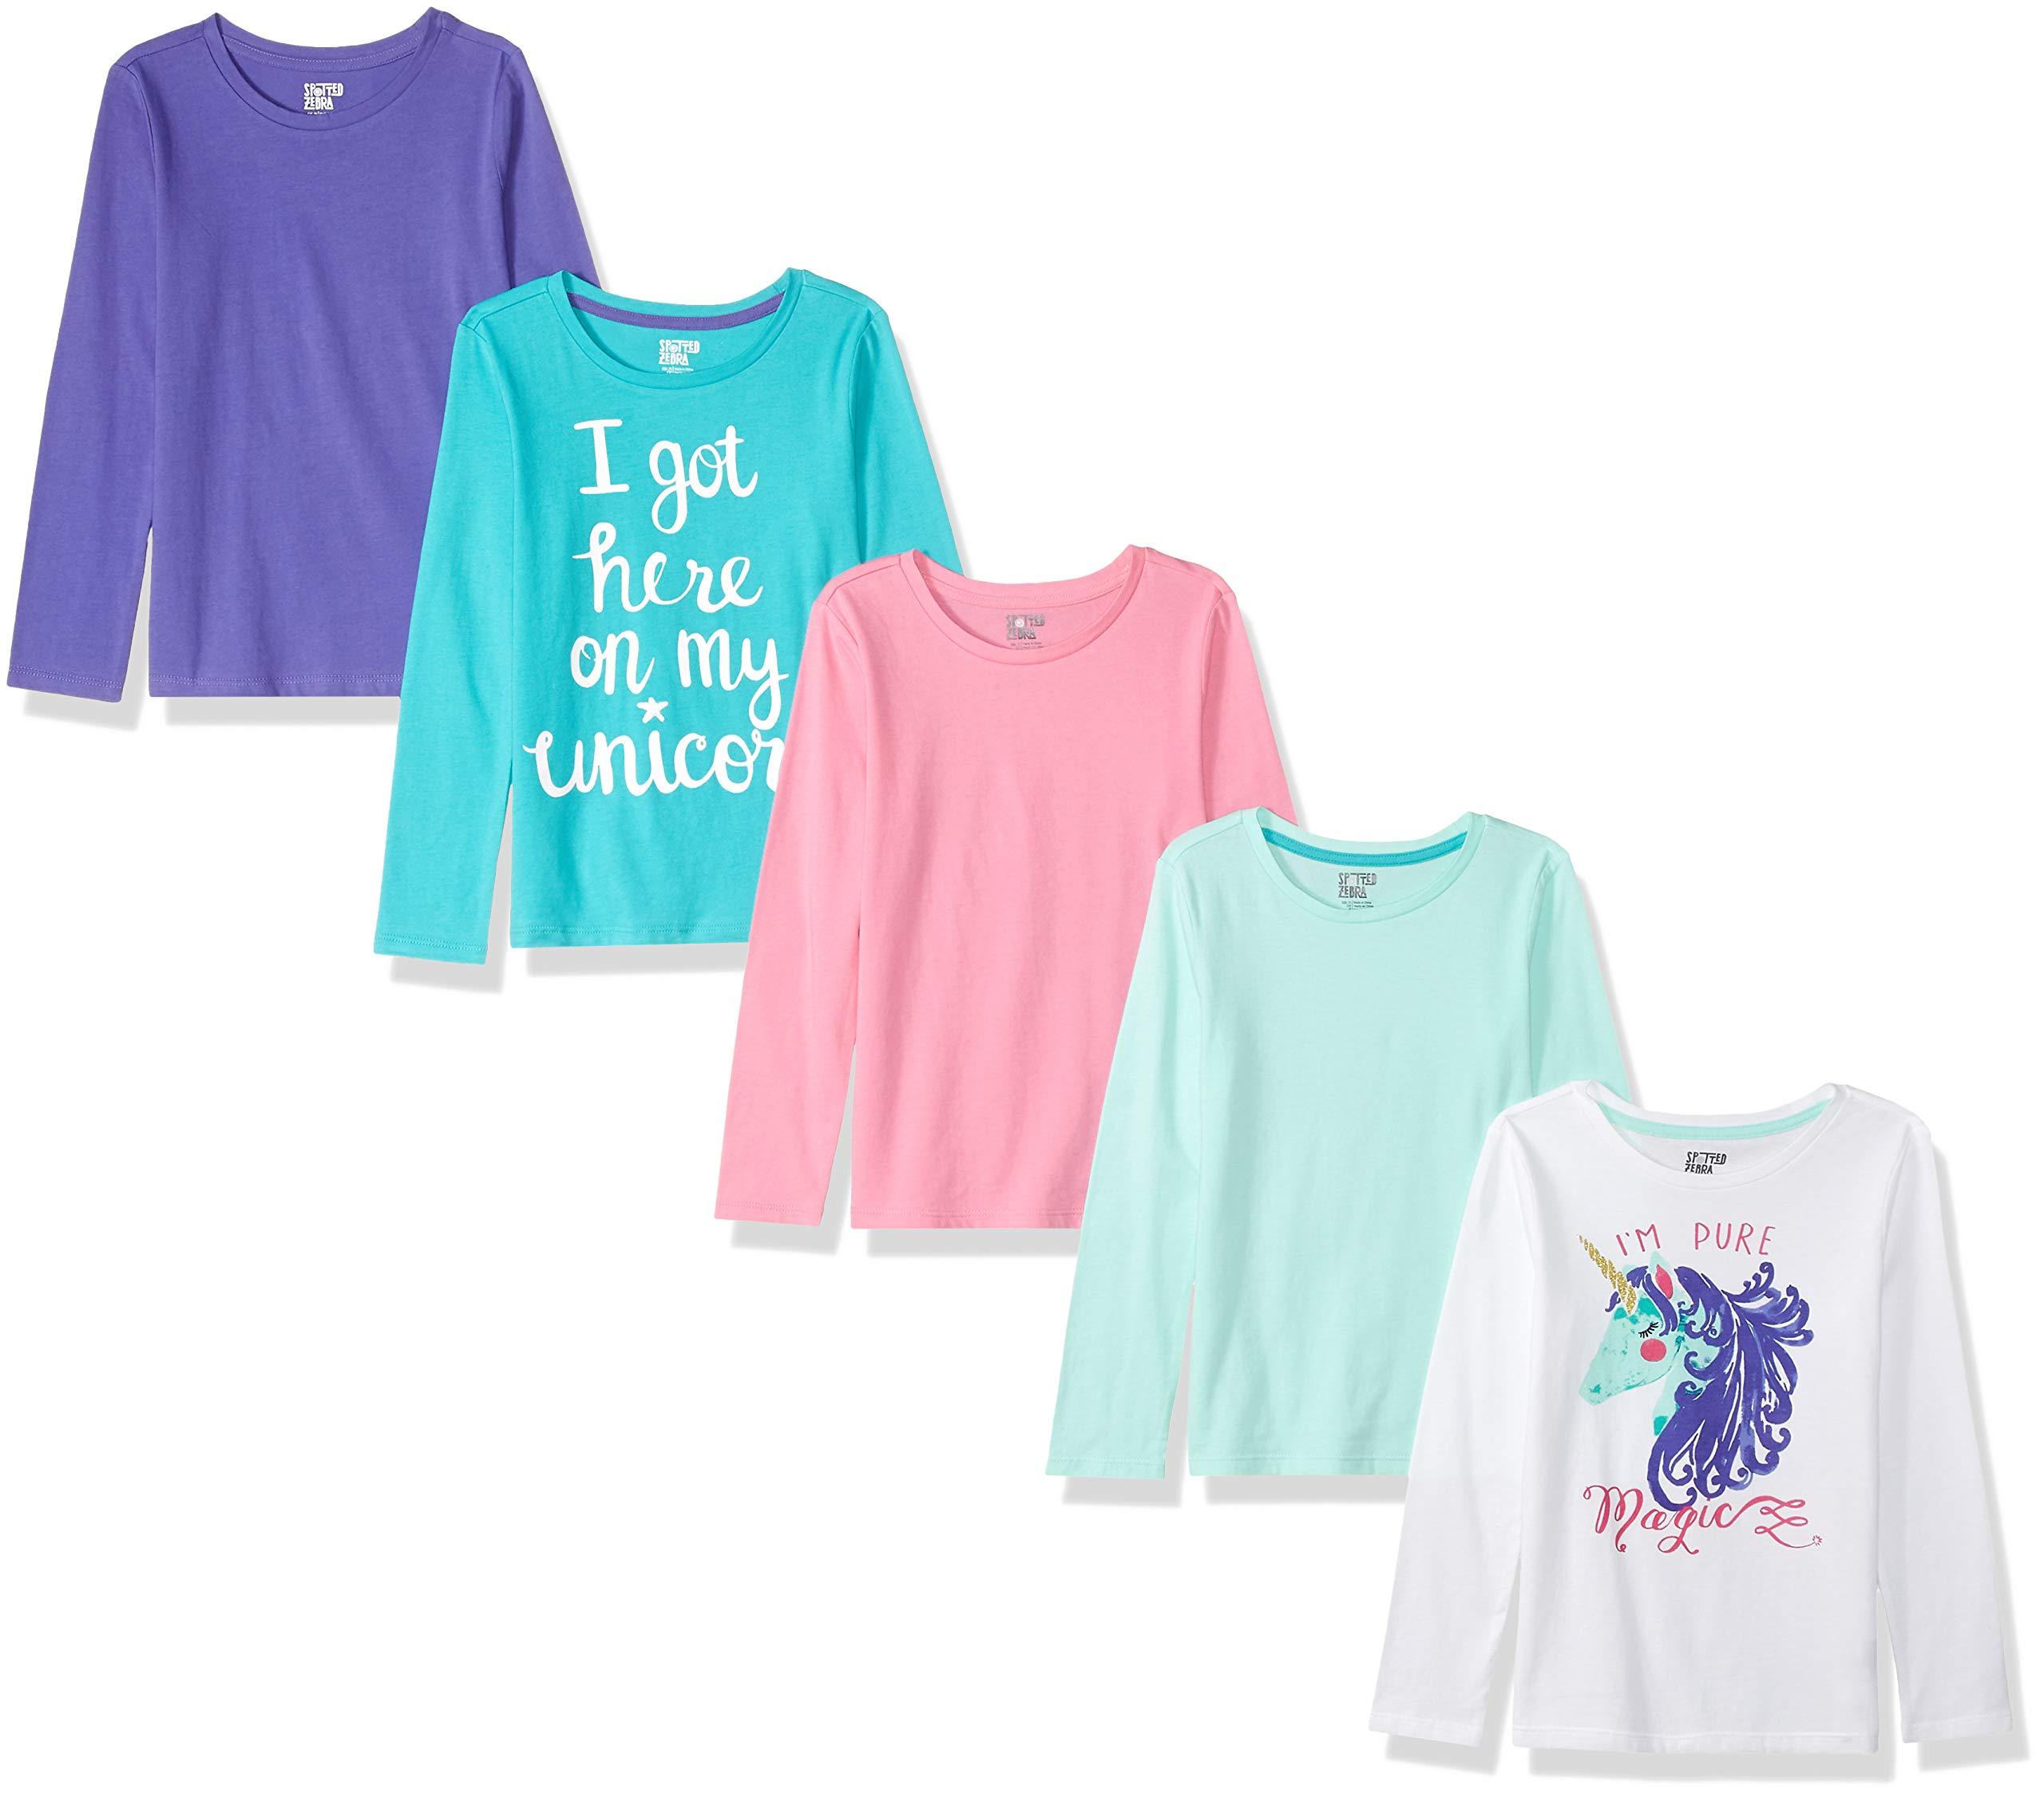 Amazon Brand - Spotted Zebra Girls' Little Kid 5-Pack Long-Sleeve T-Shirts, Magic, Small (6-7)